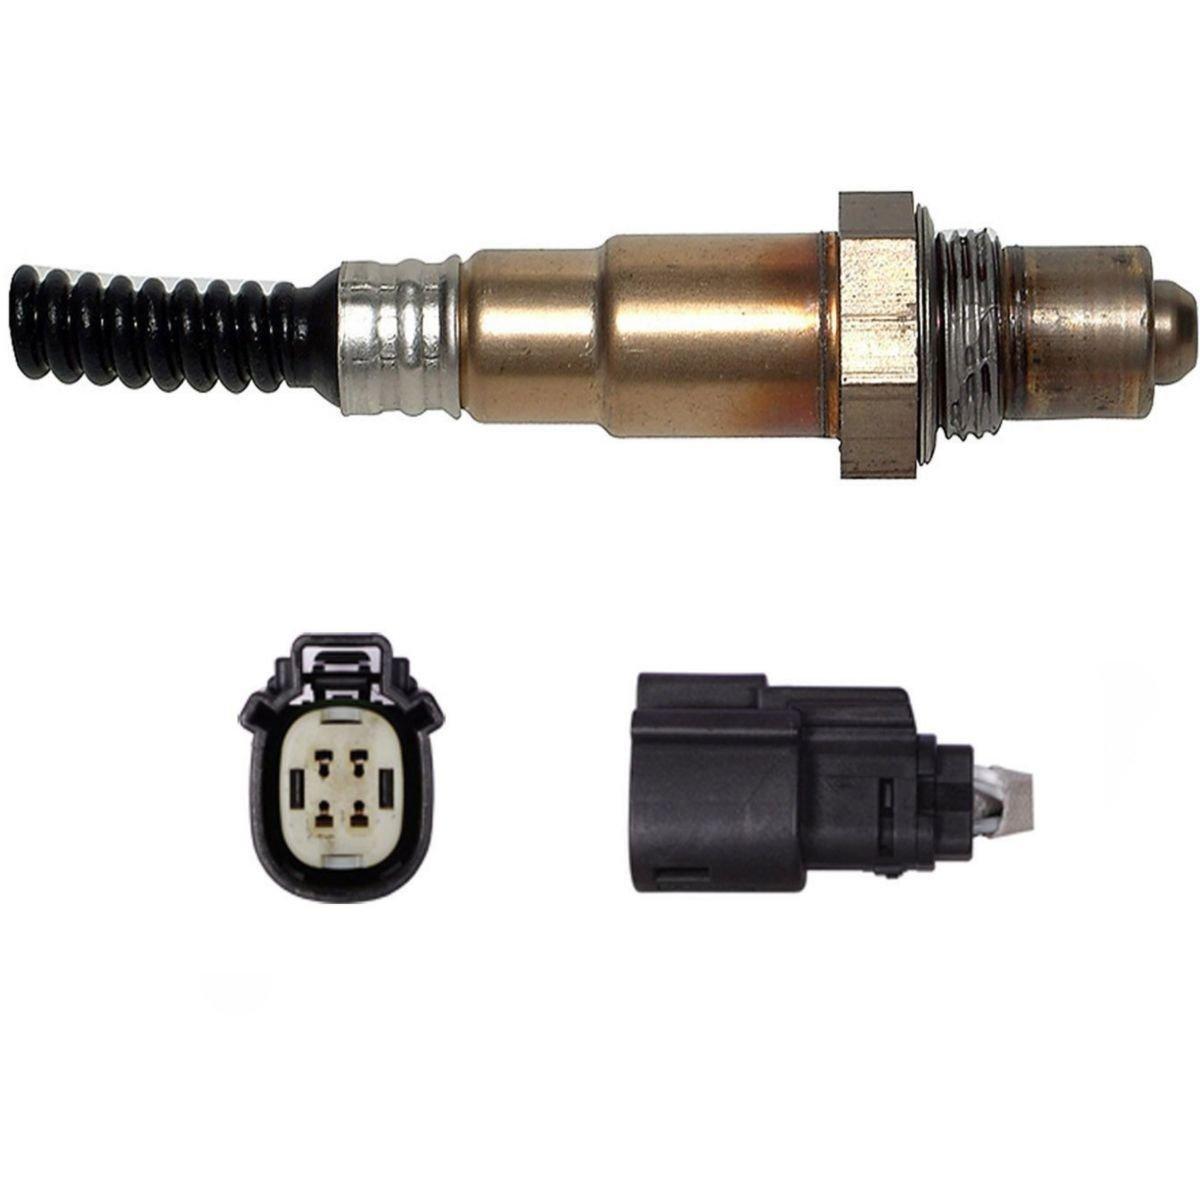 Downstream Oxygen Sensor For Ford Explorer Focus Escape Wiring Edge 20l Automotive